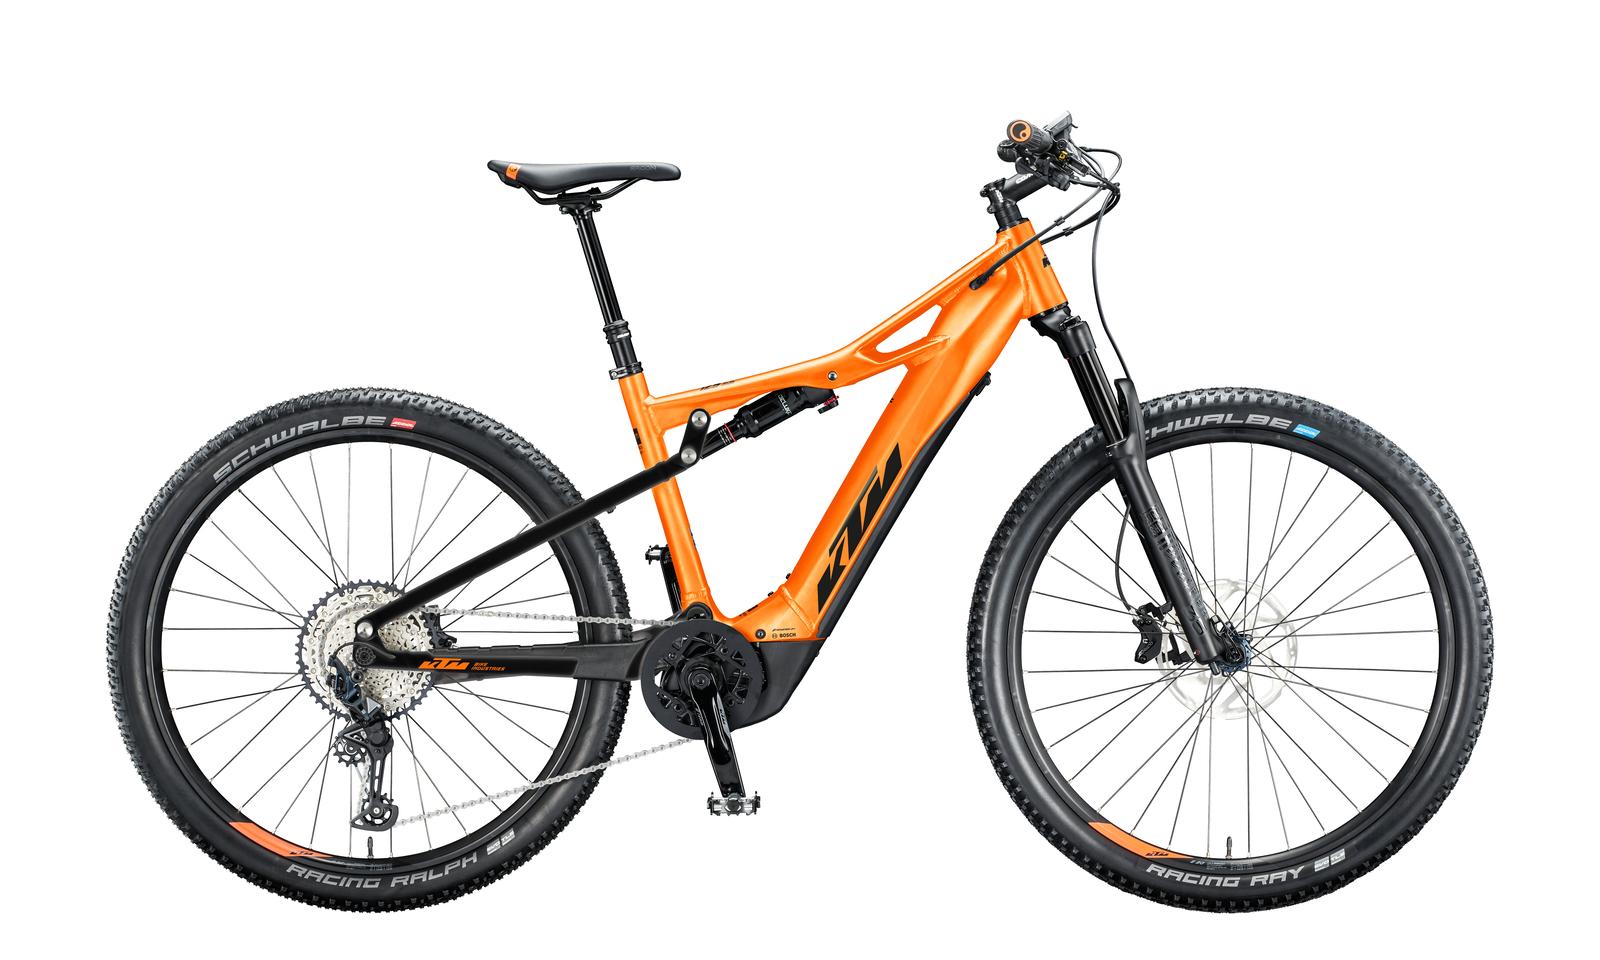 Bikeparadies KTM Chacana